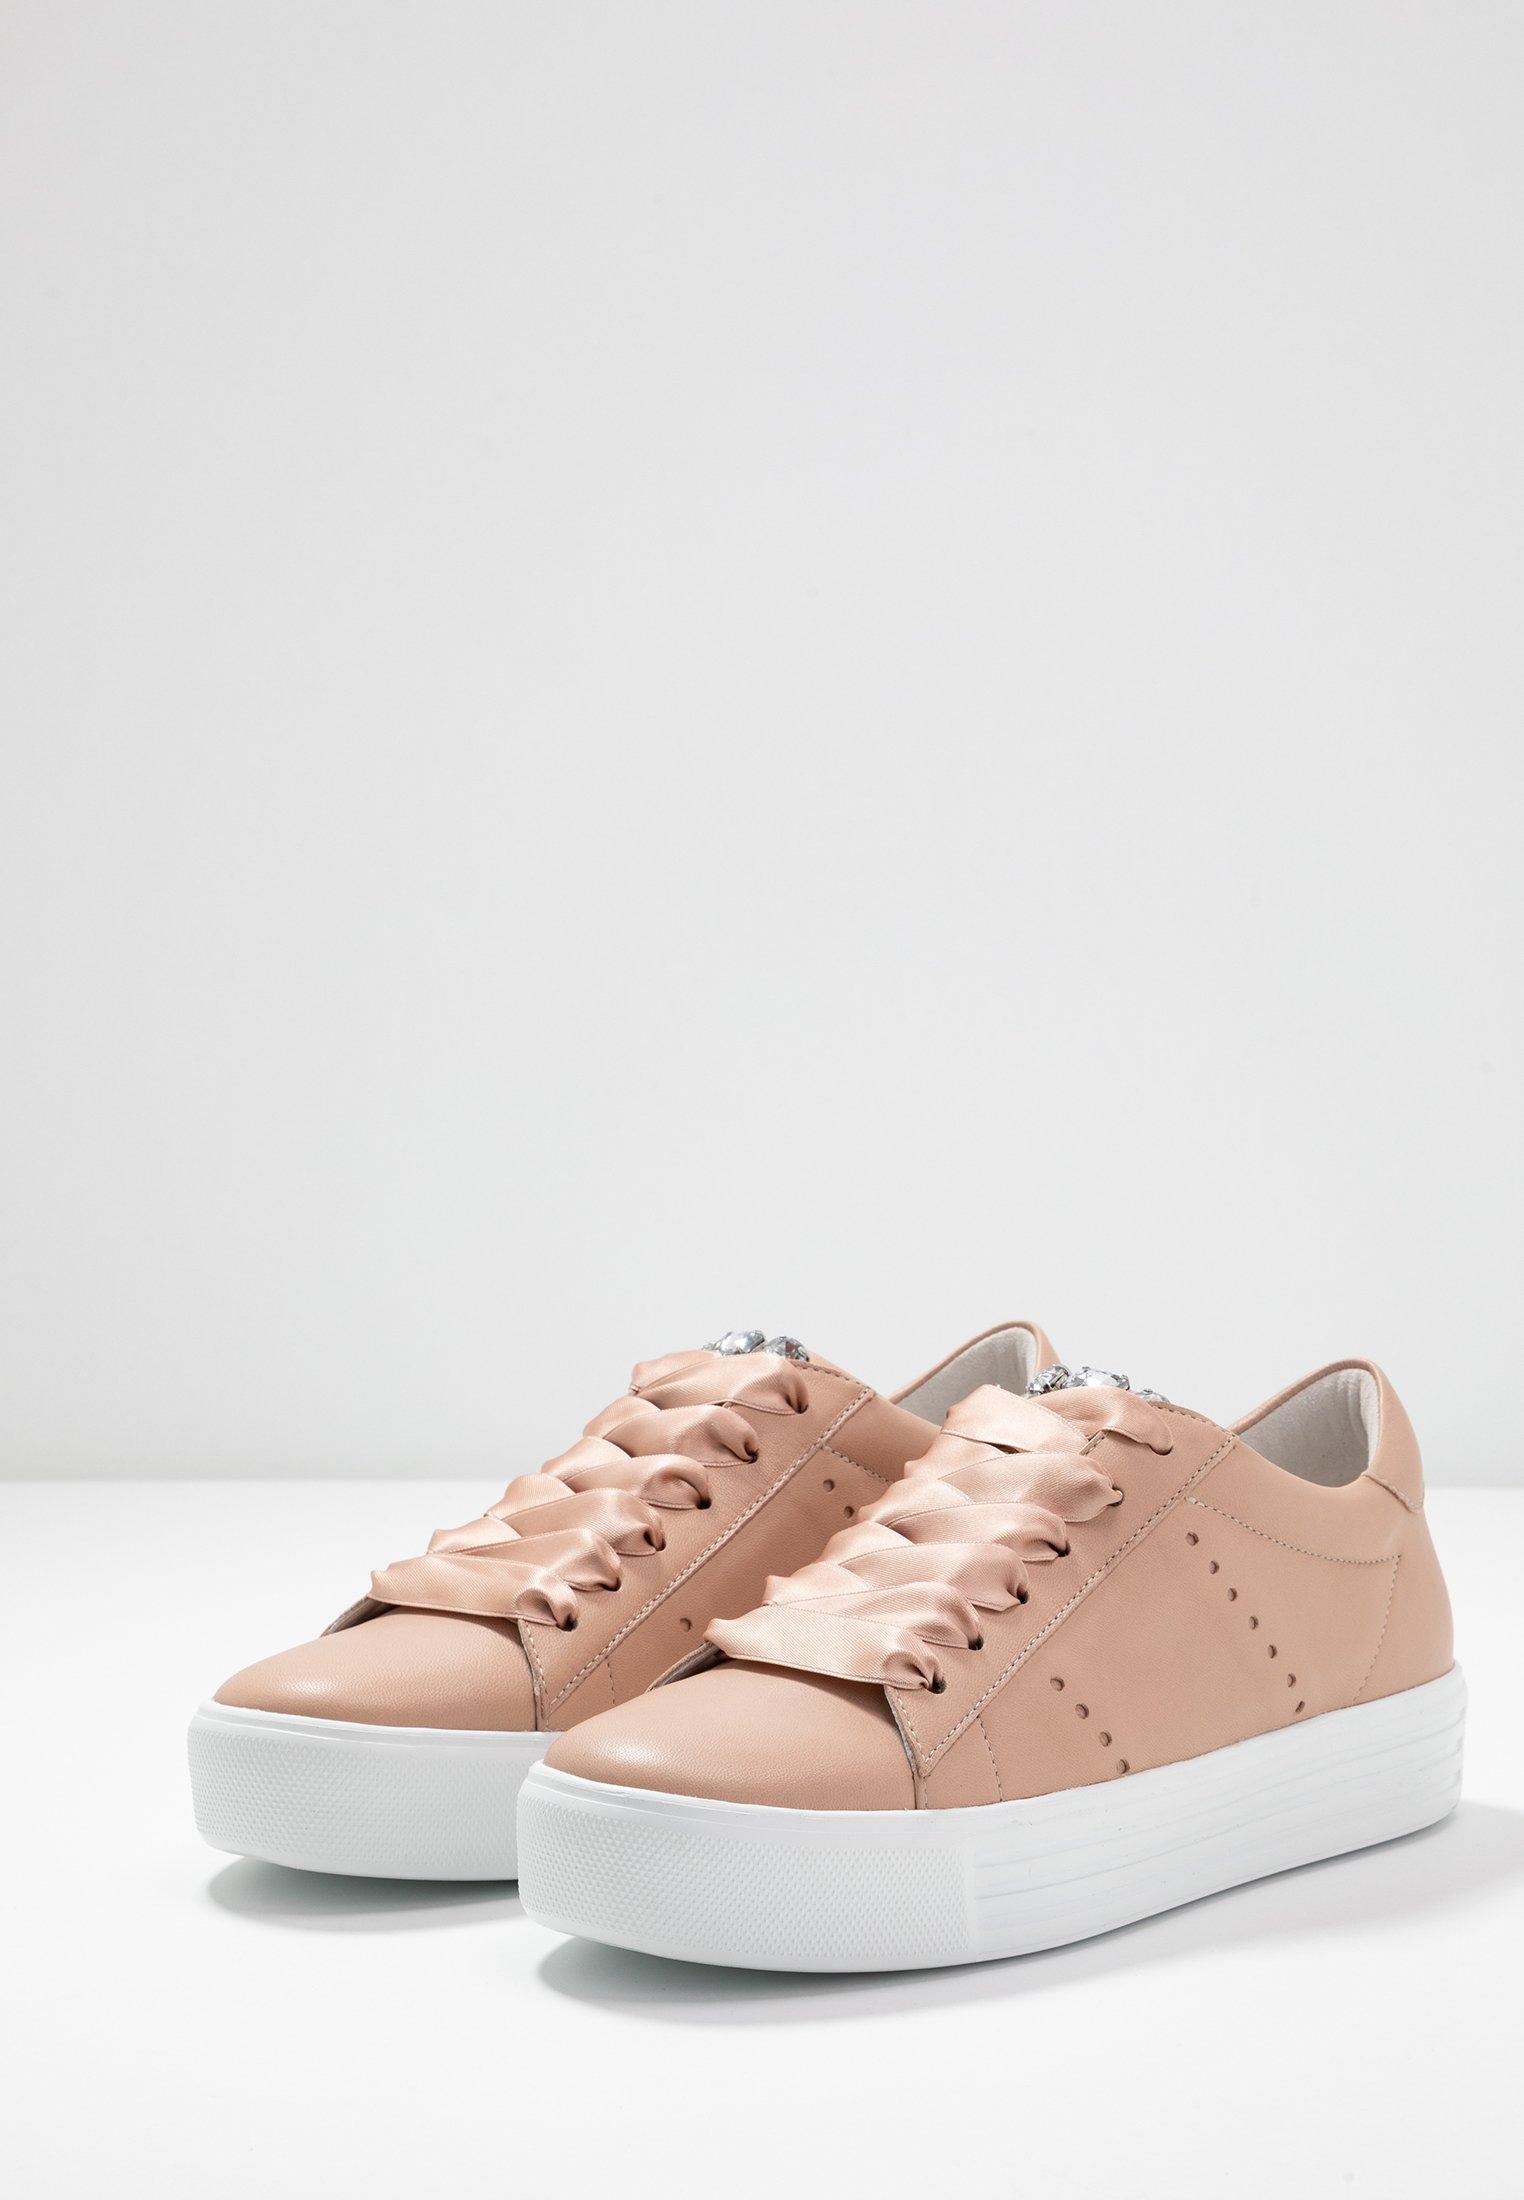 Kennel + Schmenger UP - Sneakers - nude